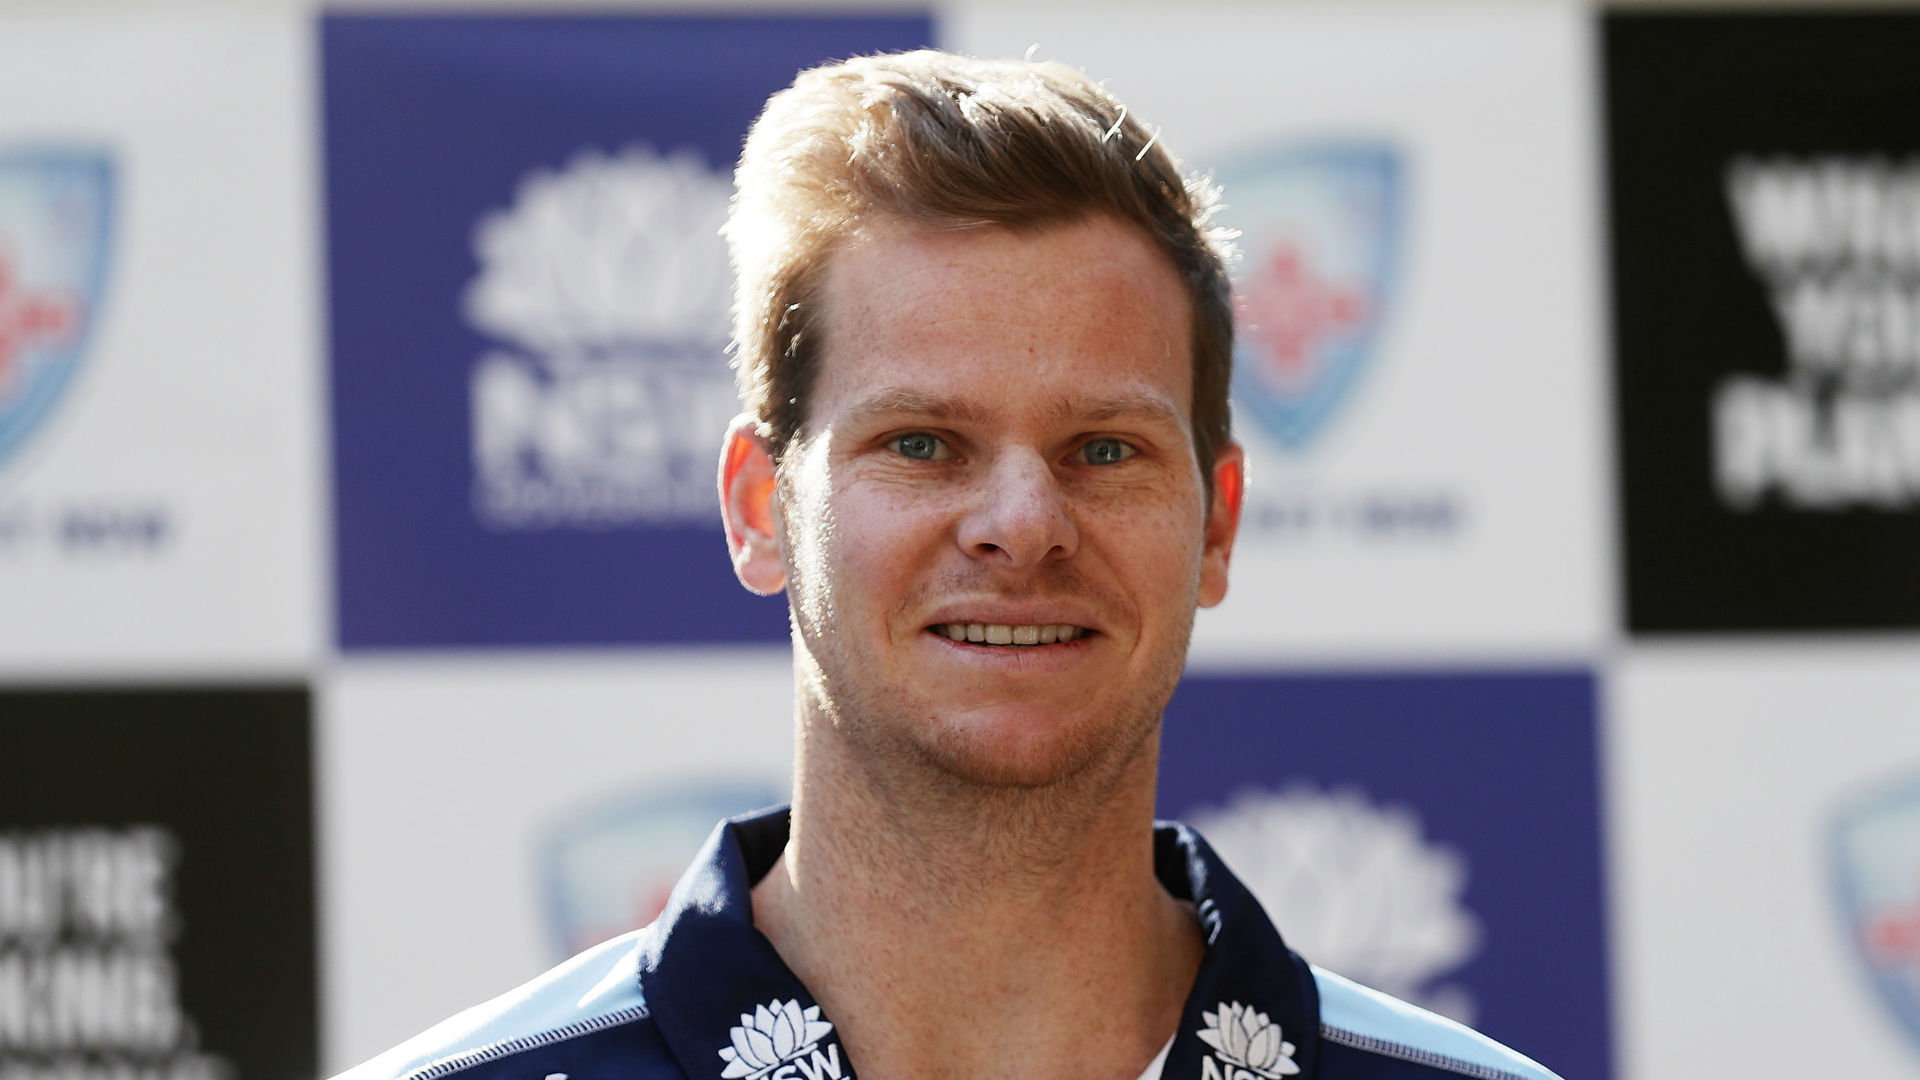 Coronavirus: Smith says IPL would be 'terrific' alternative if T20 World Cup is postponed